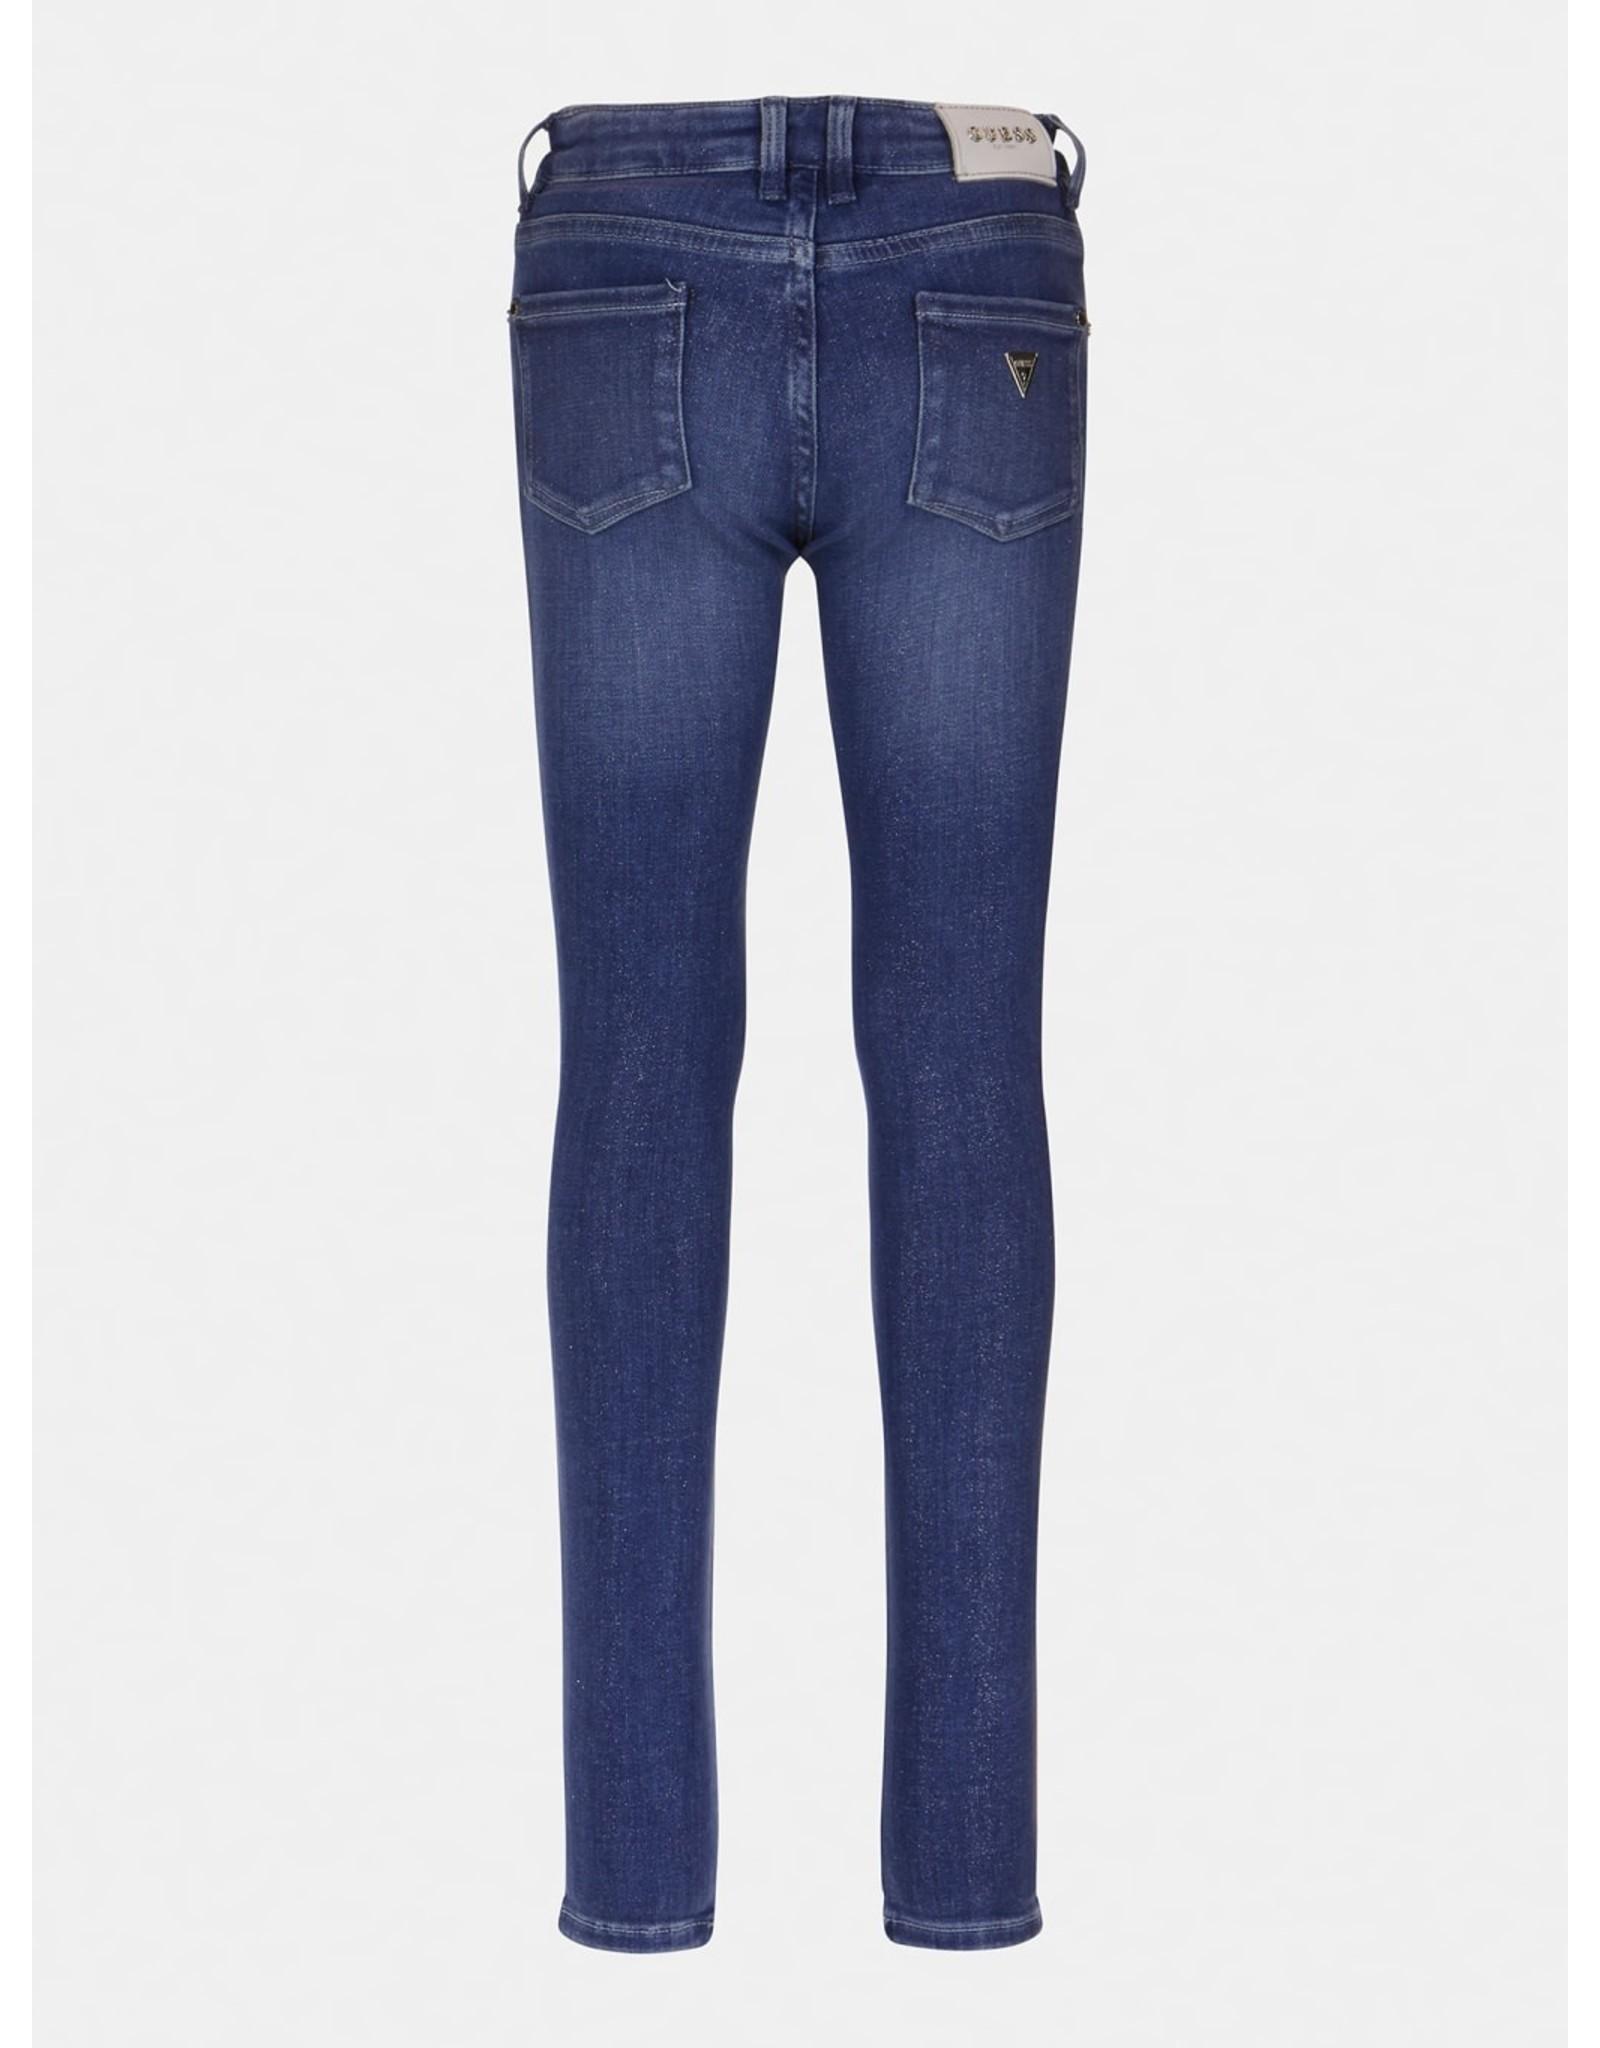 Guess Glitter Jeans Blue